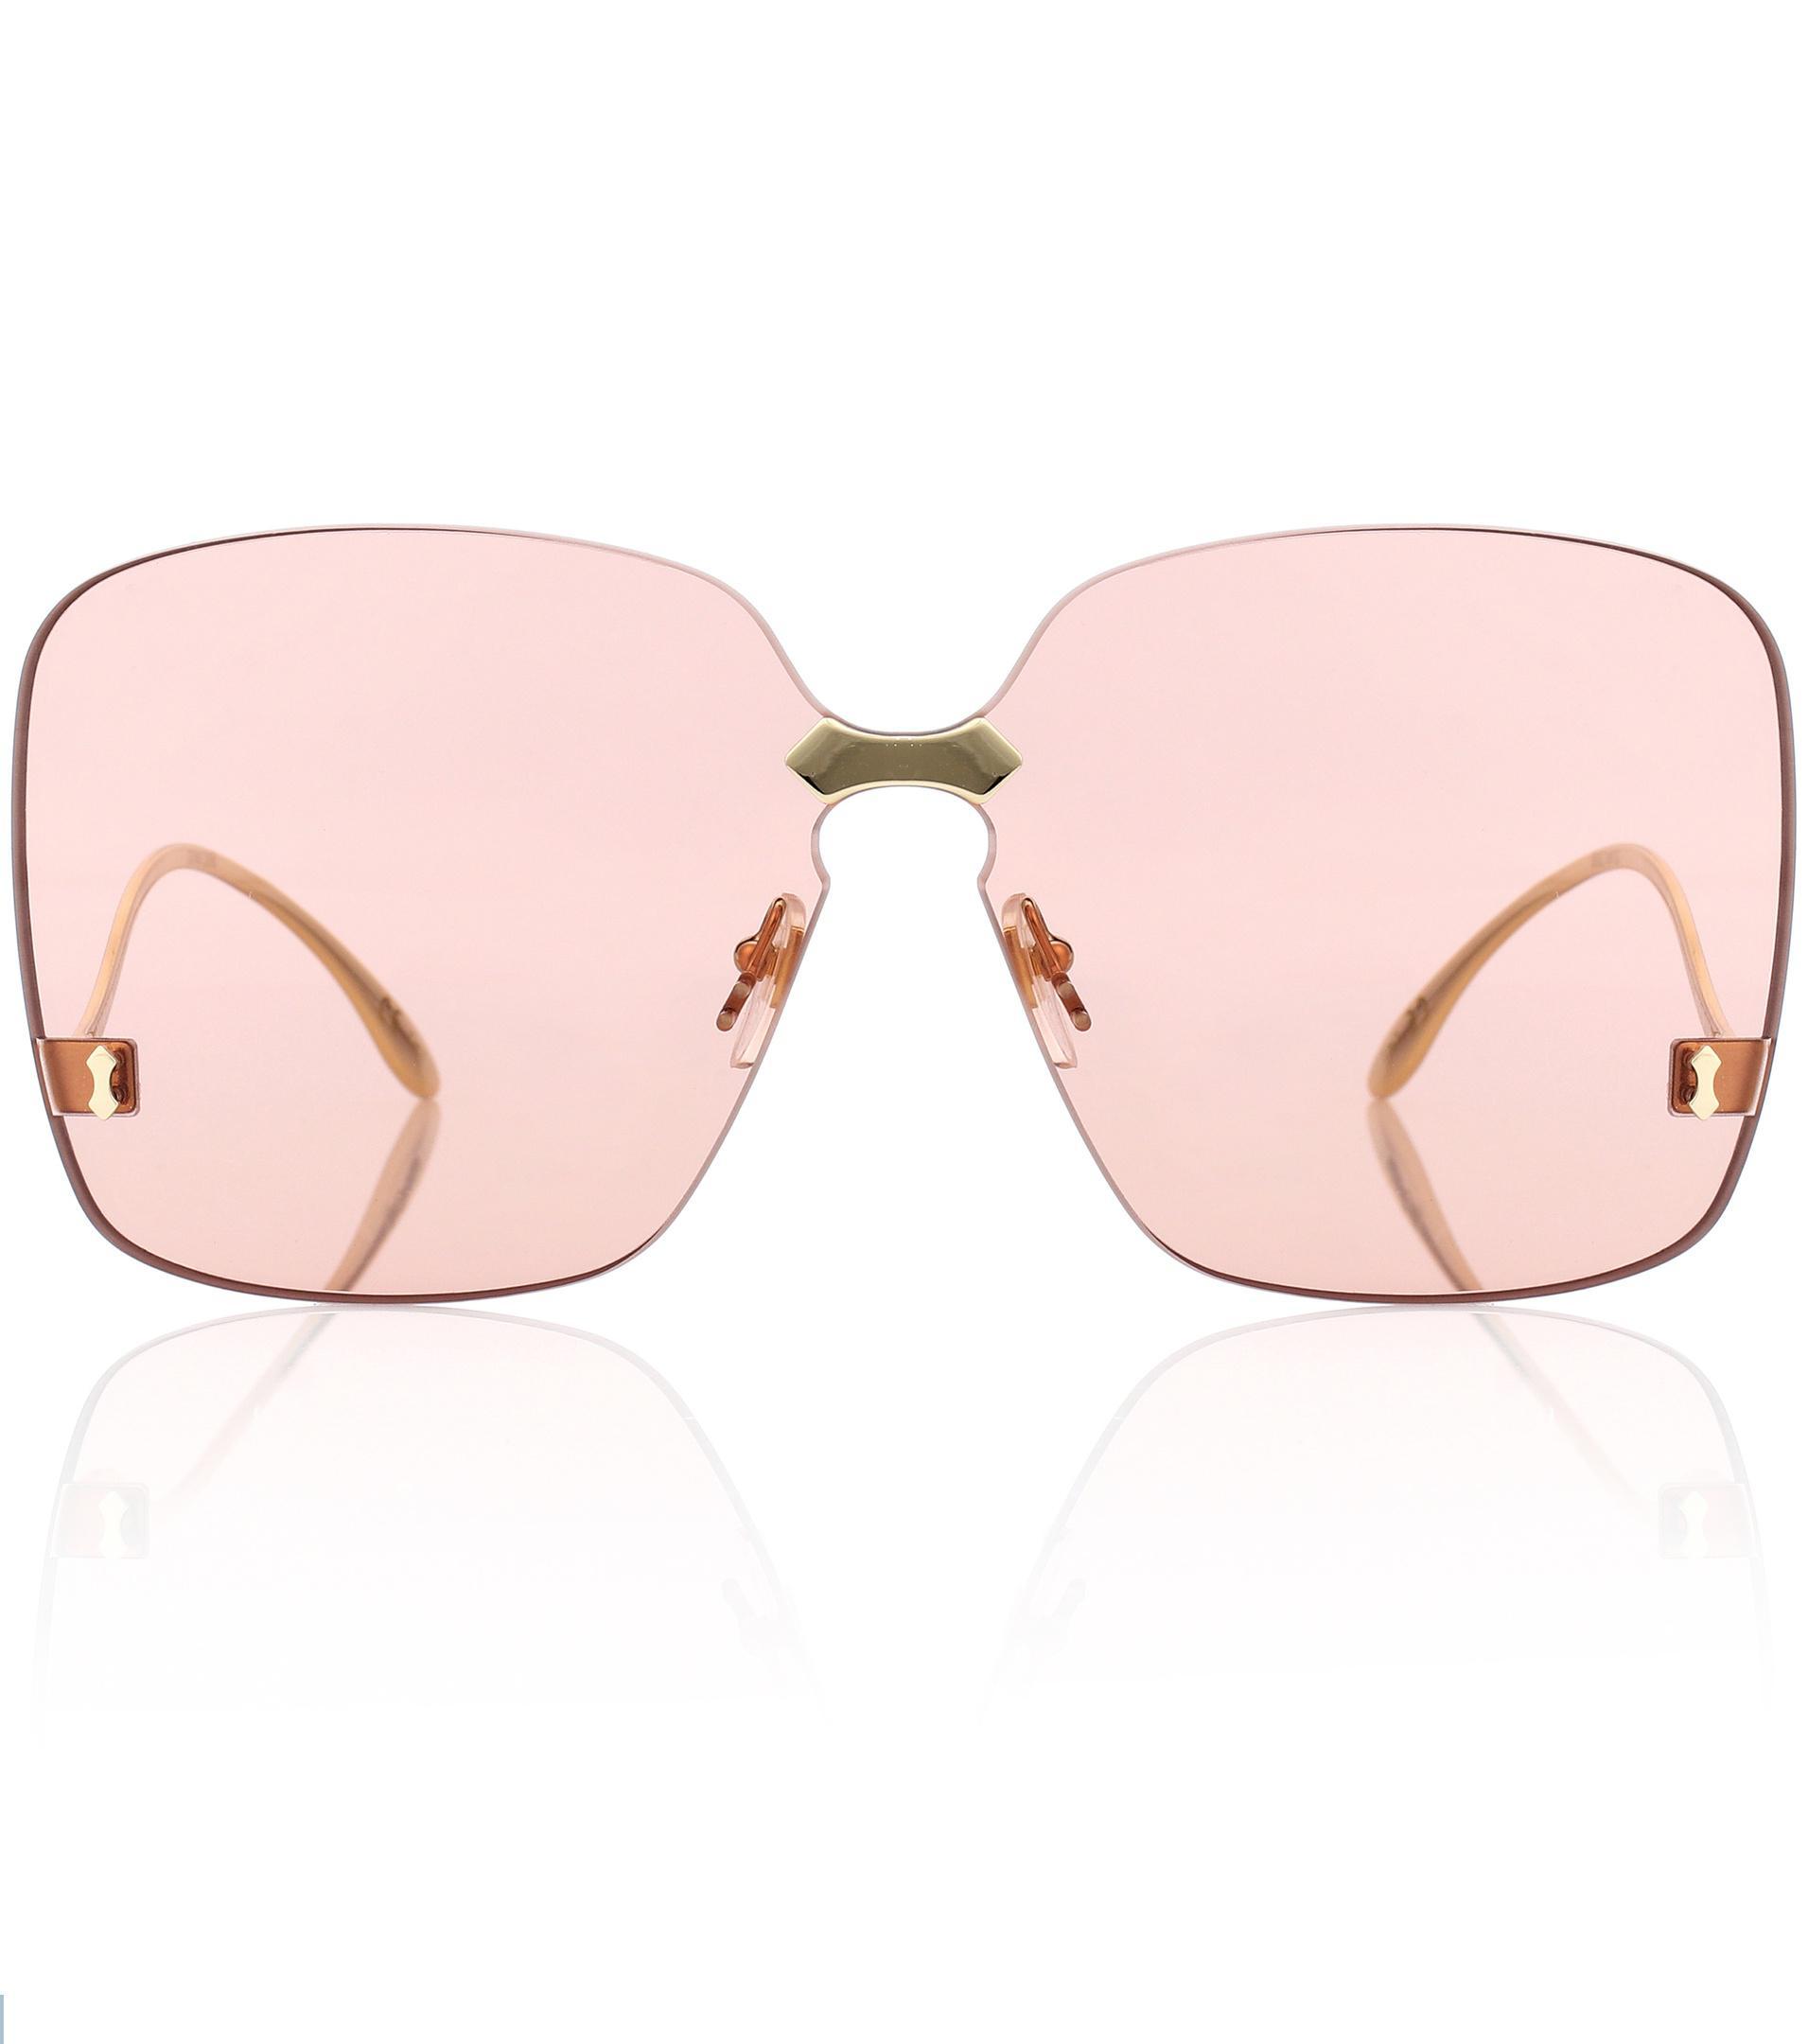 a1cab1f061 Gafas de sol cuadradas sin marco Gucci de color Rosa - Lyst